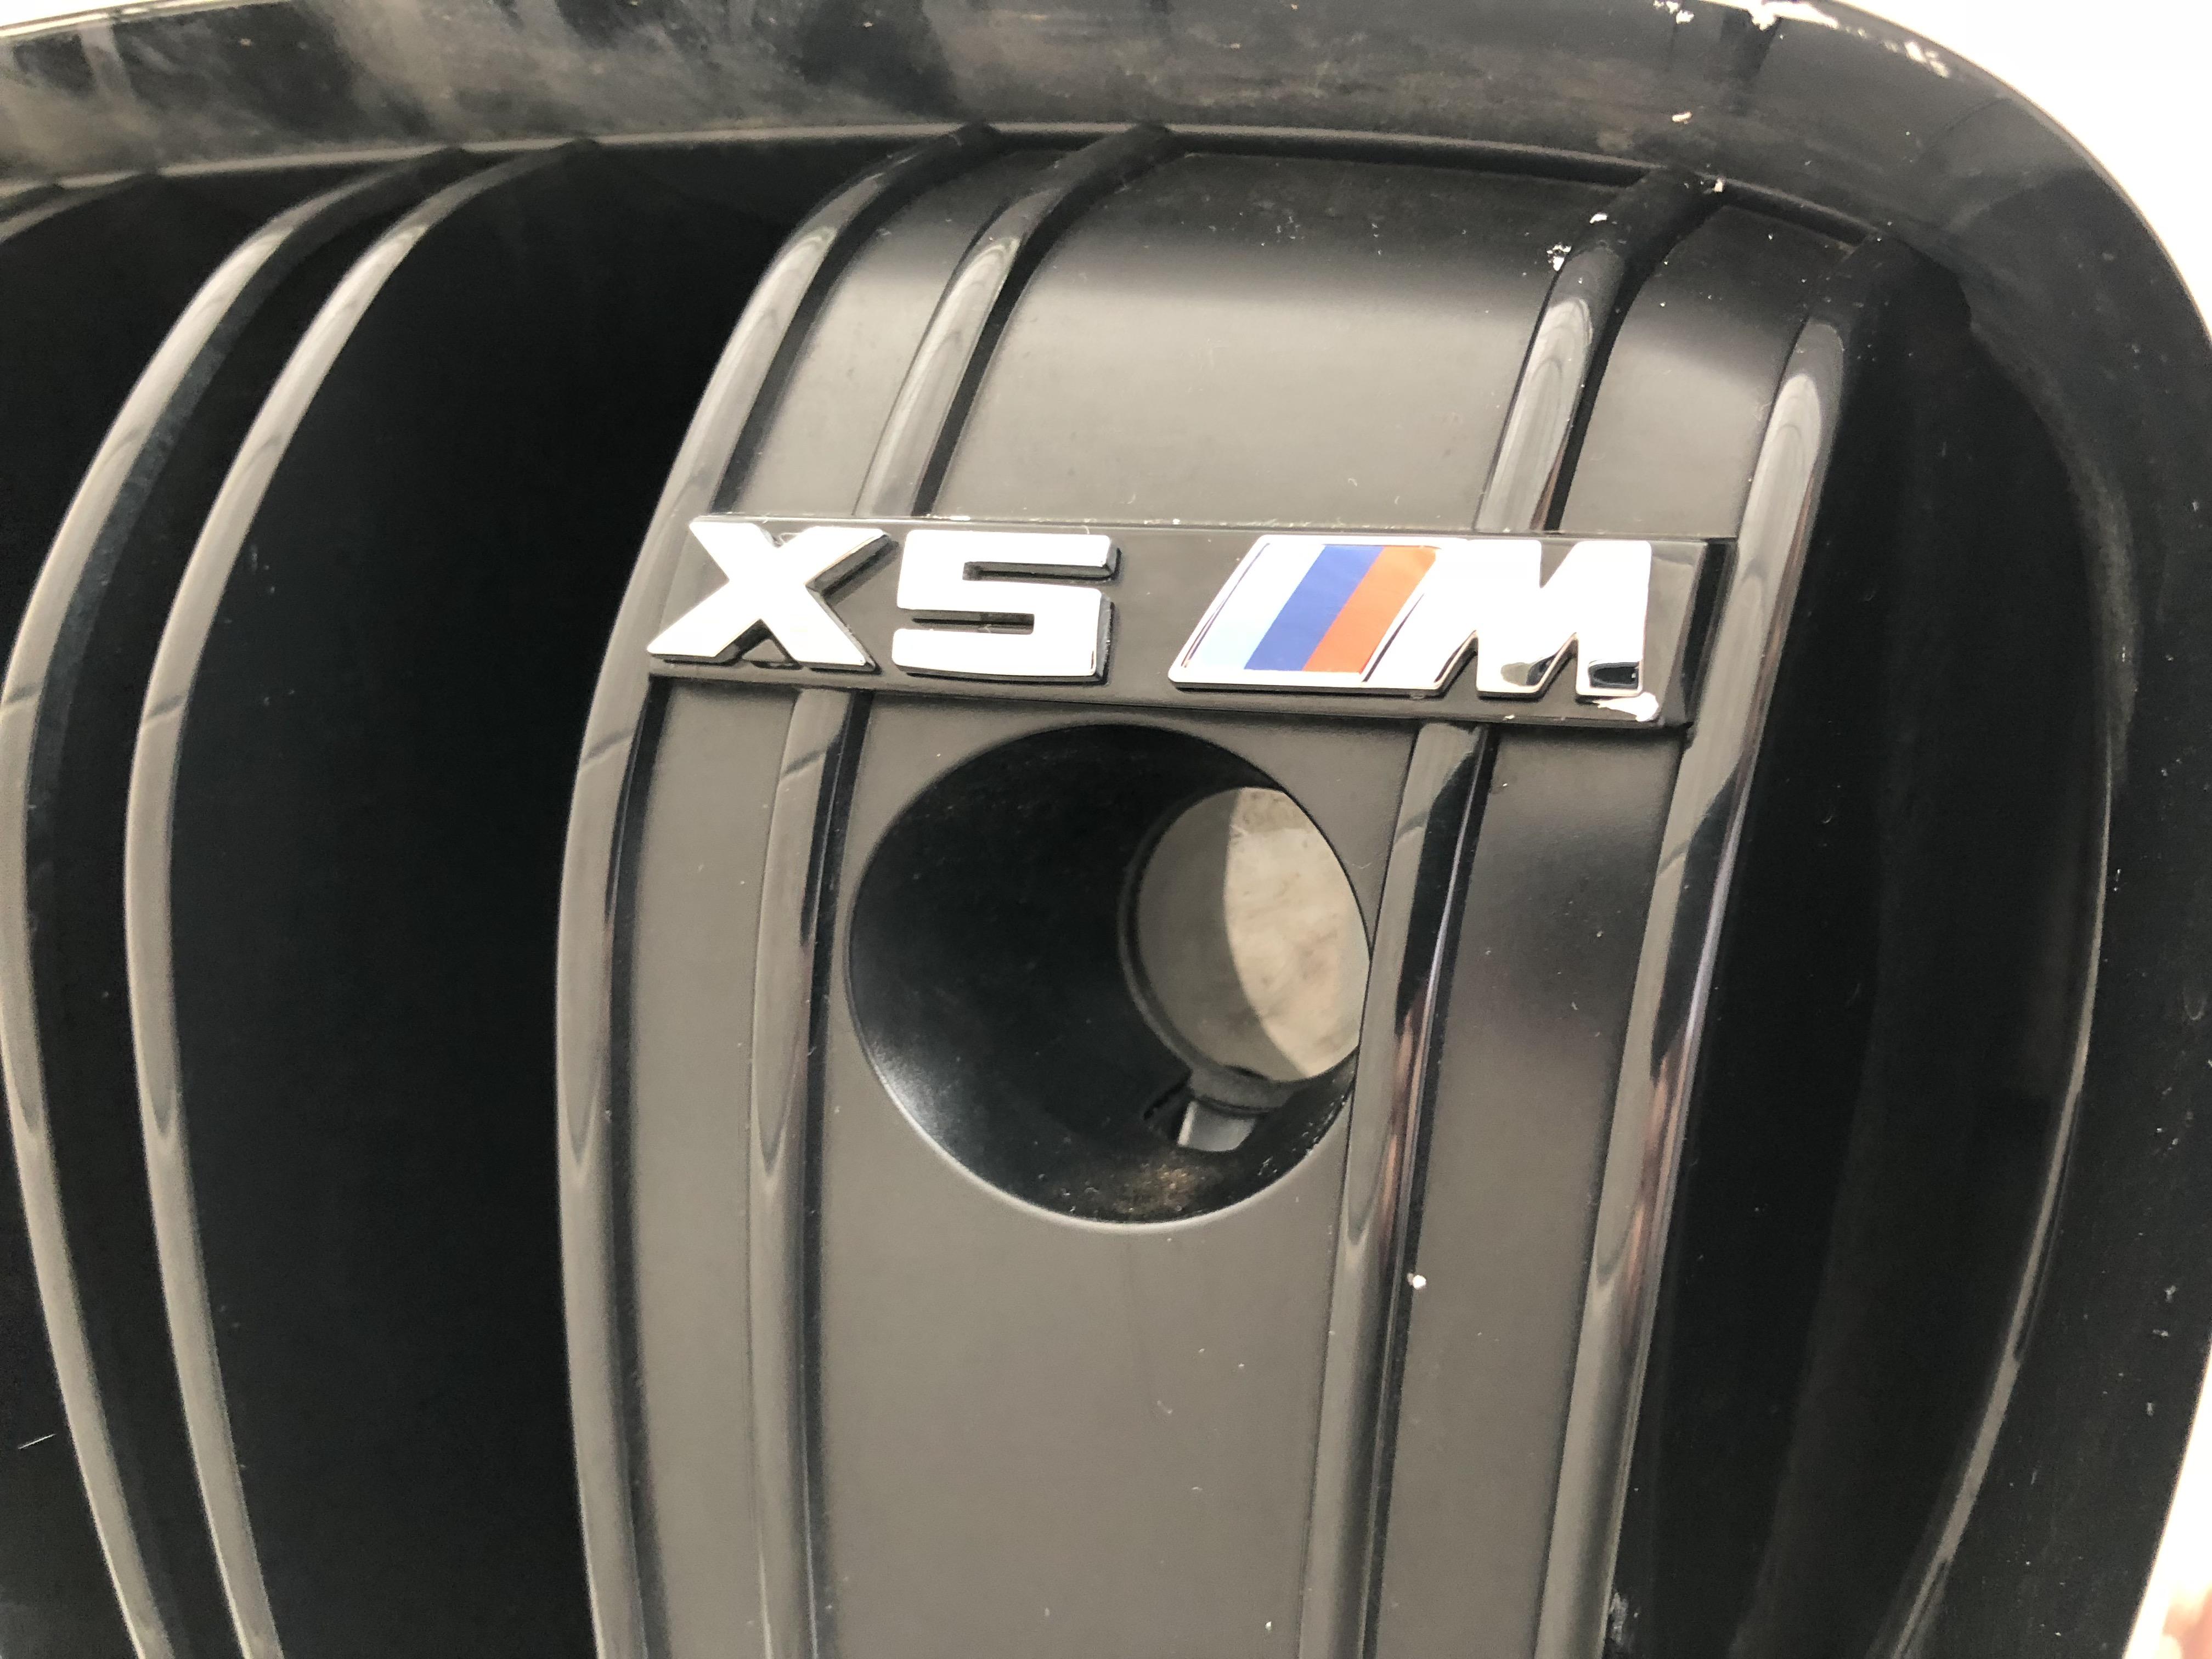 BMW_X5M_2018_07.jpg